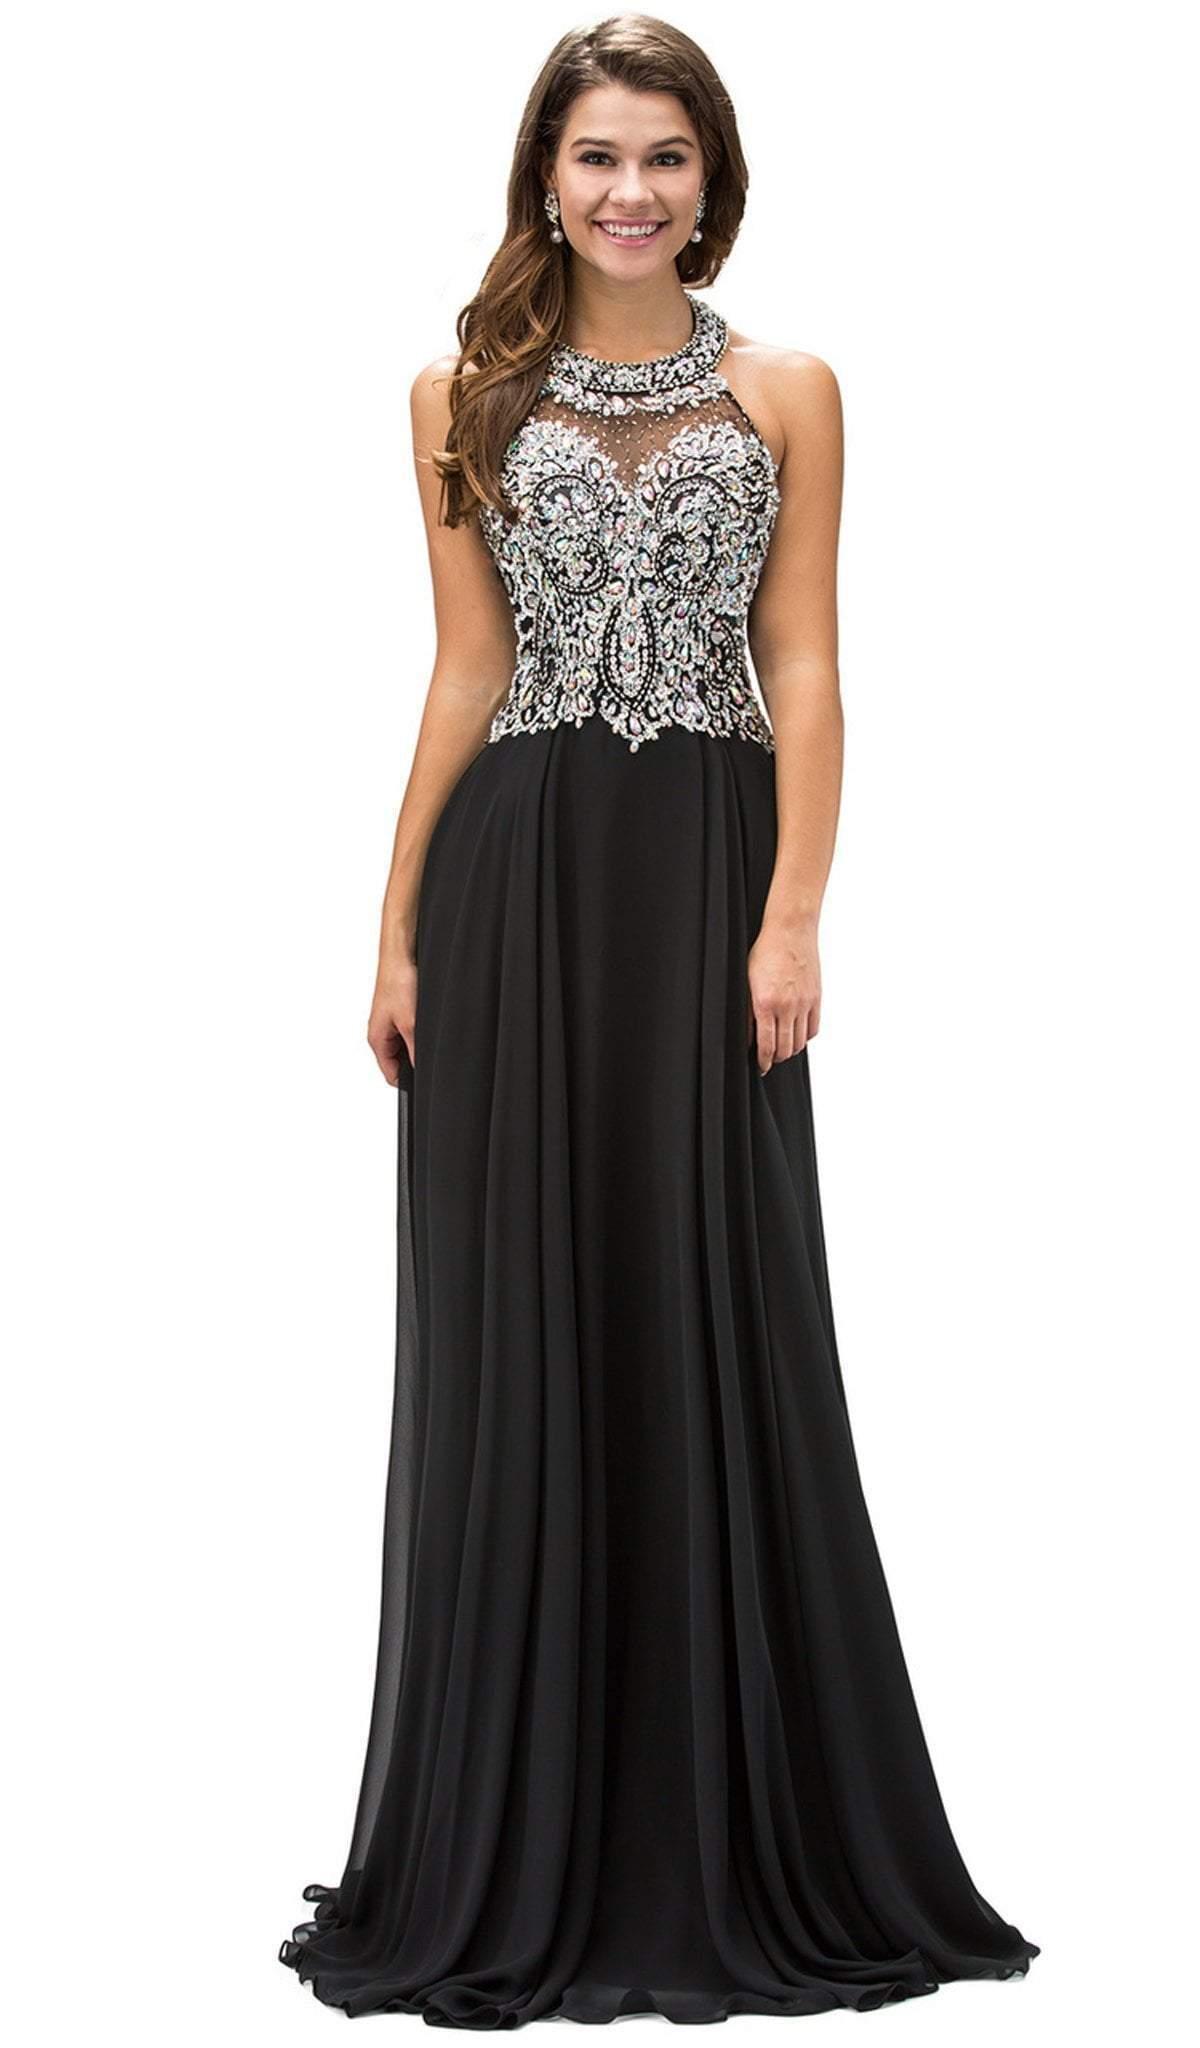 Dancing Queen - 9233 Jewel Adorned Illusion Chiffon Prom Dress